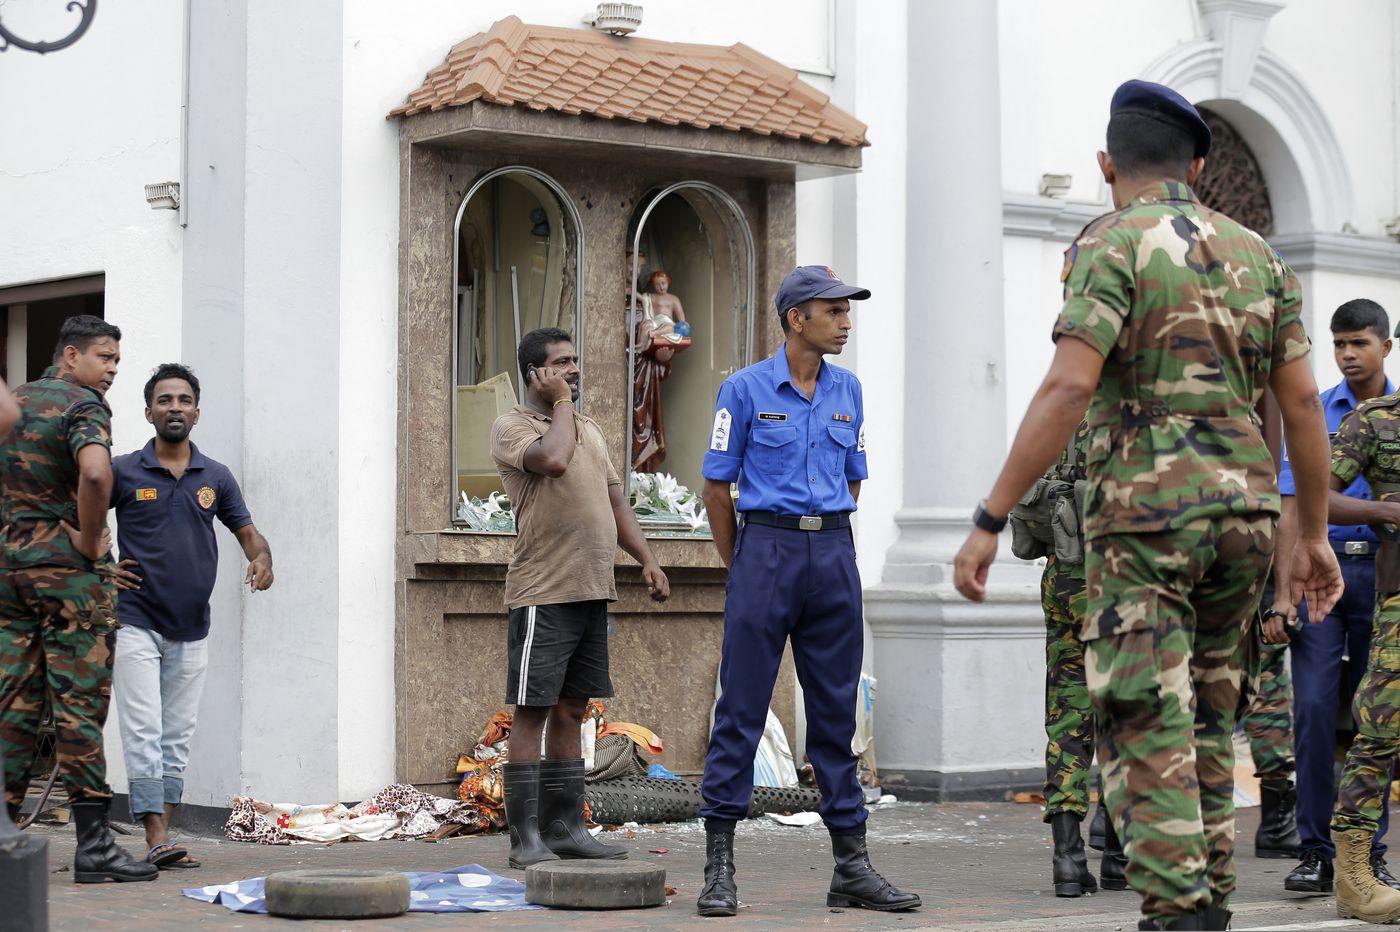 Explosions kill hundreds in Sri Lanka on Easter Sunday